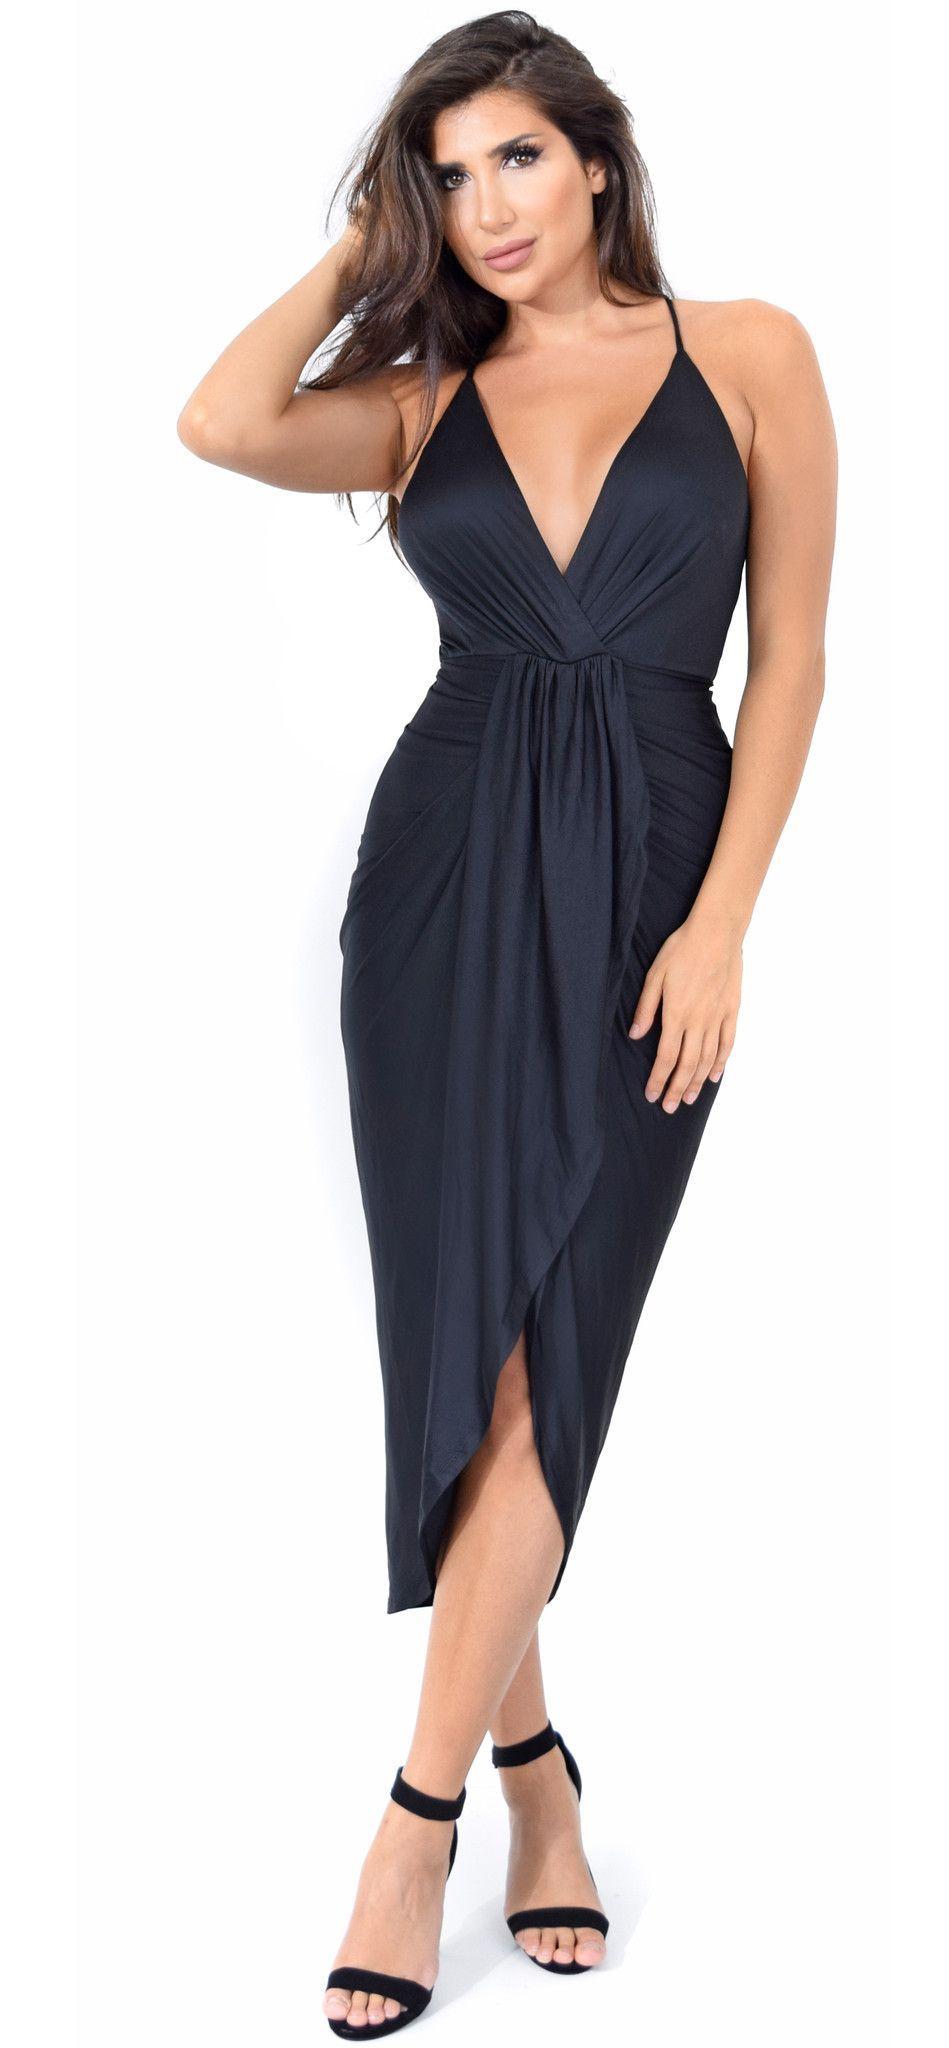 Jeanina Black Deep V Drape Dress  576c14c9a